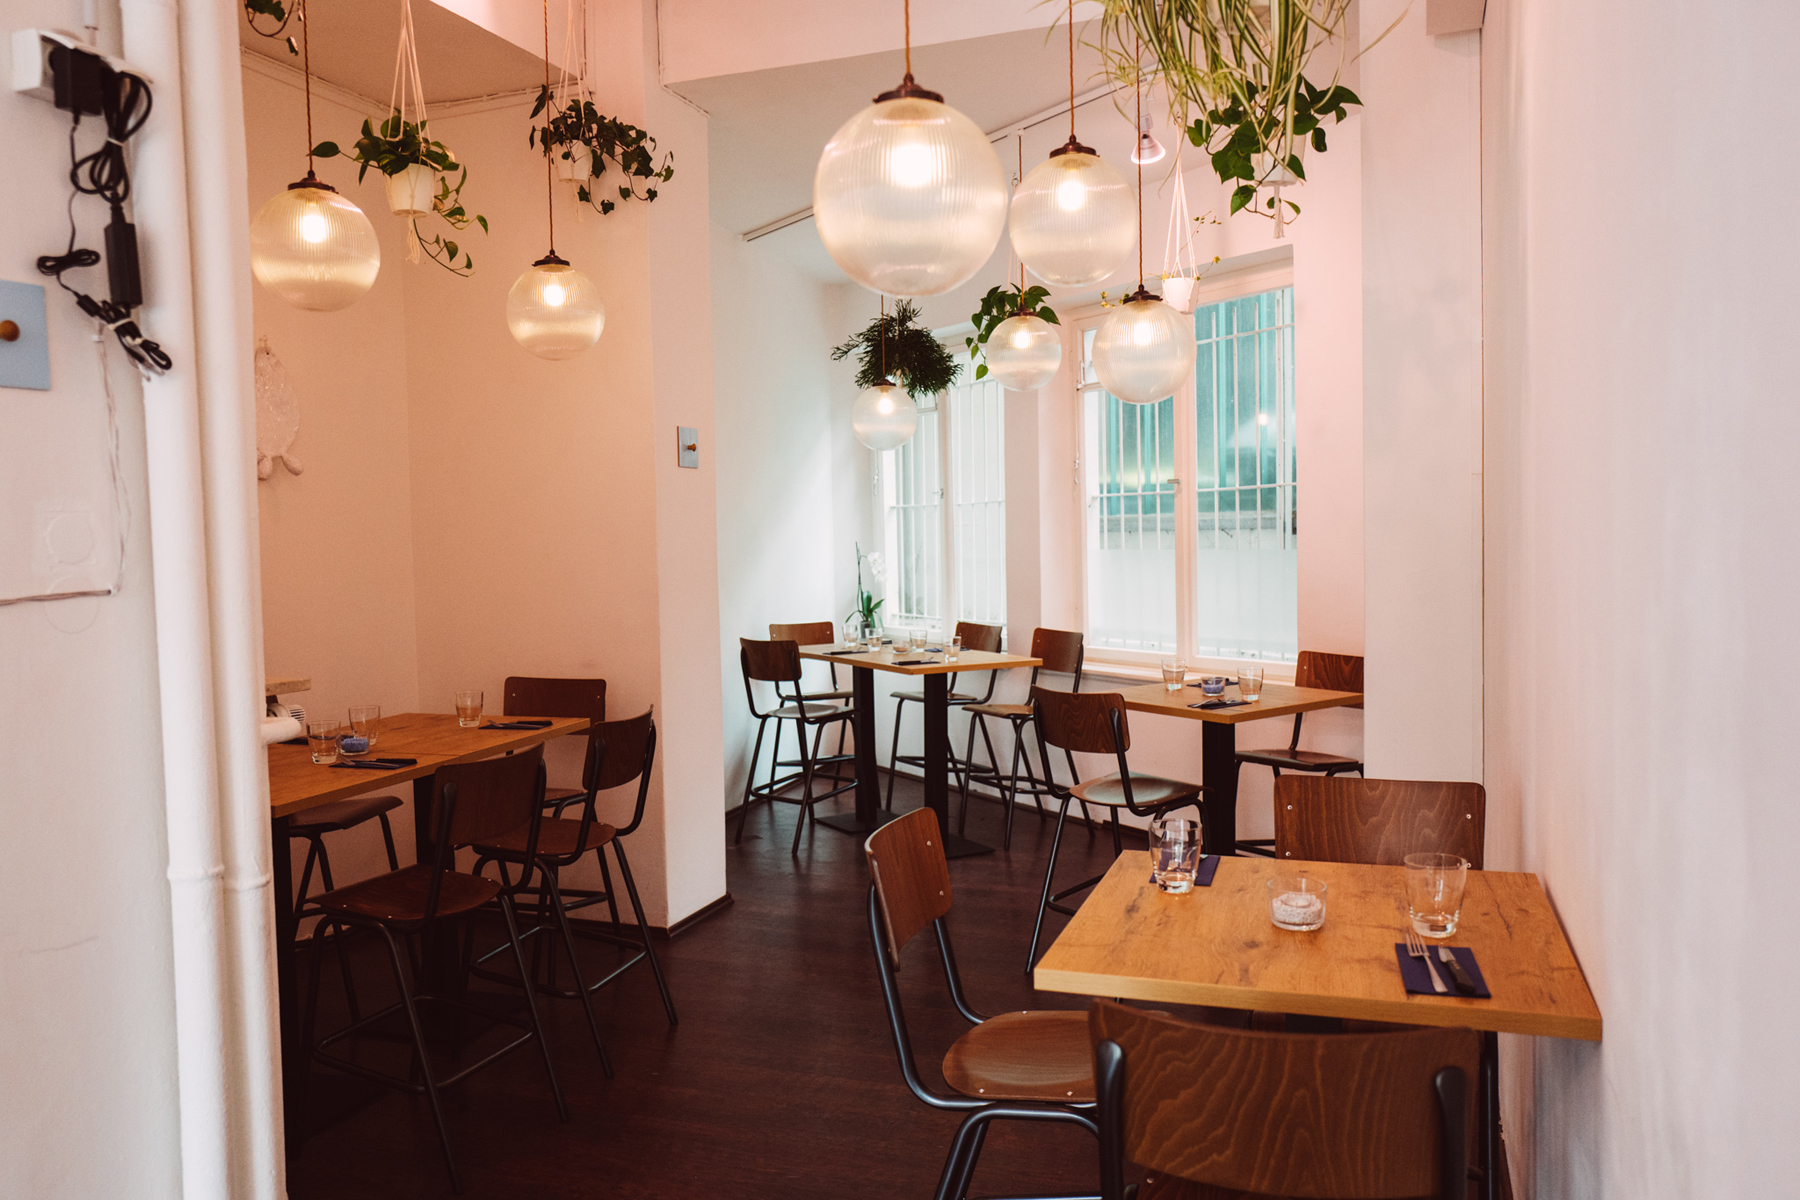 Geheimtipp Hamburg Winterhude Restaurant Focacceria Apulia Lisa Knauer & Leonie Henze 21